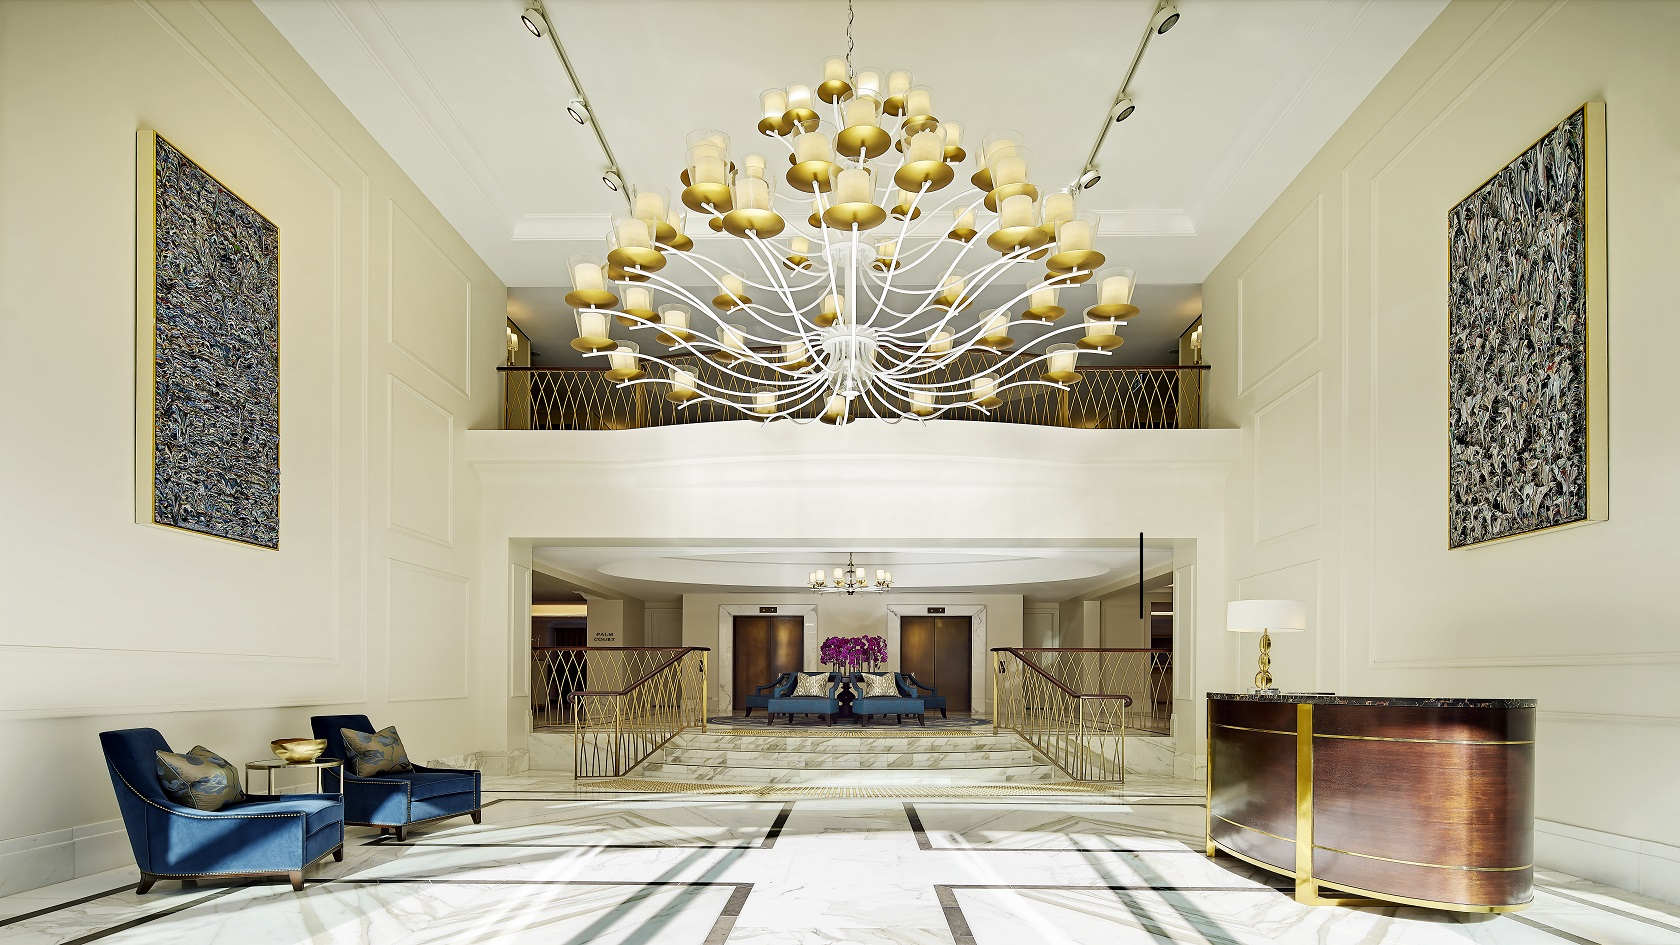 Grand Hotel Foyer : Just landed travel news highlights